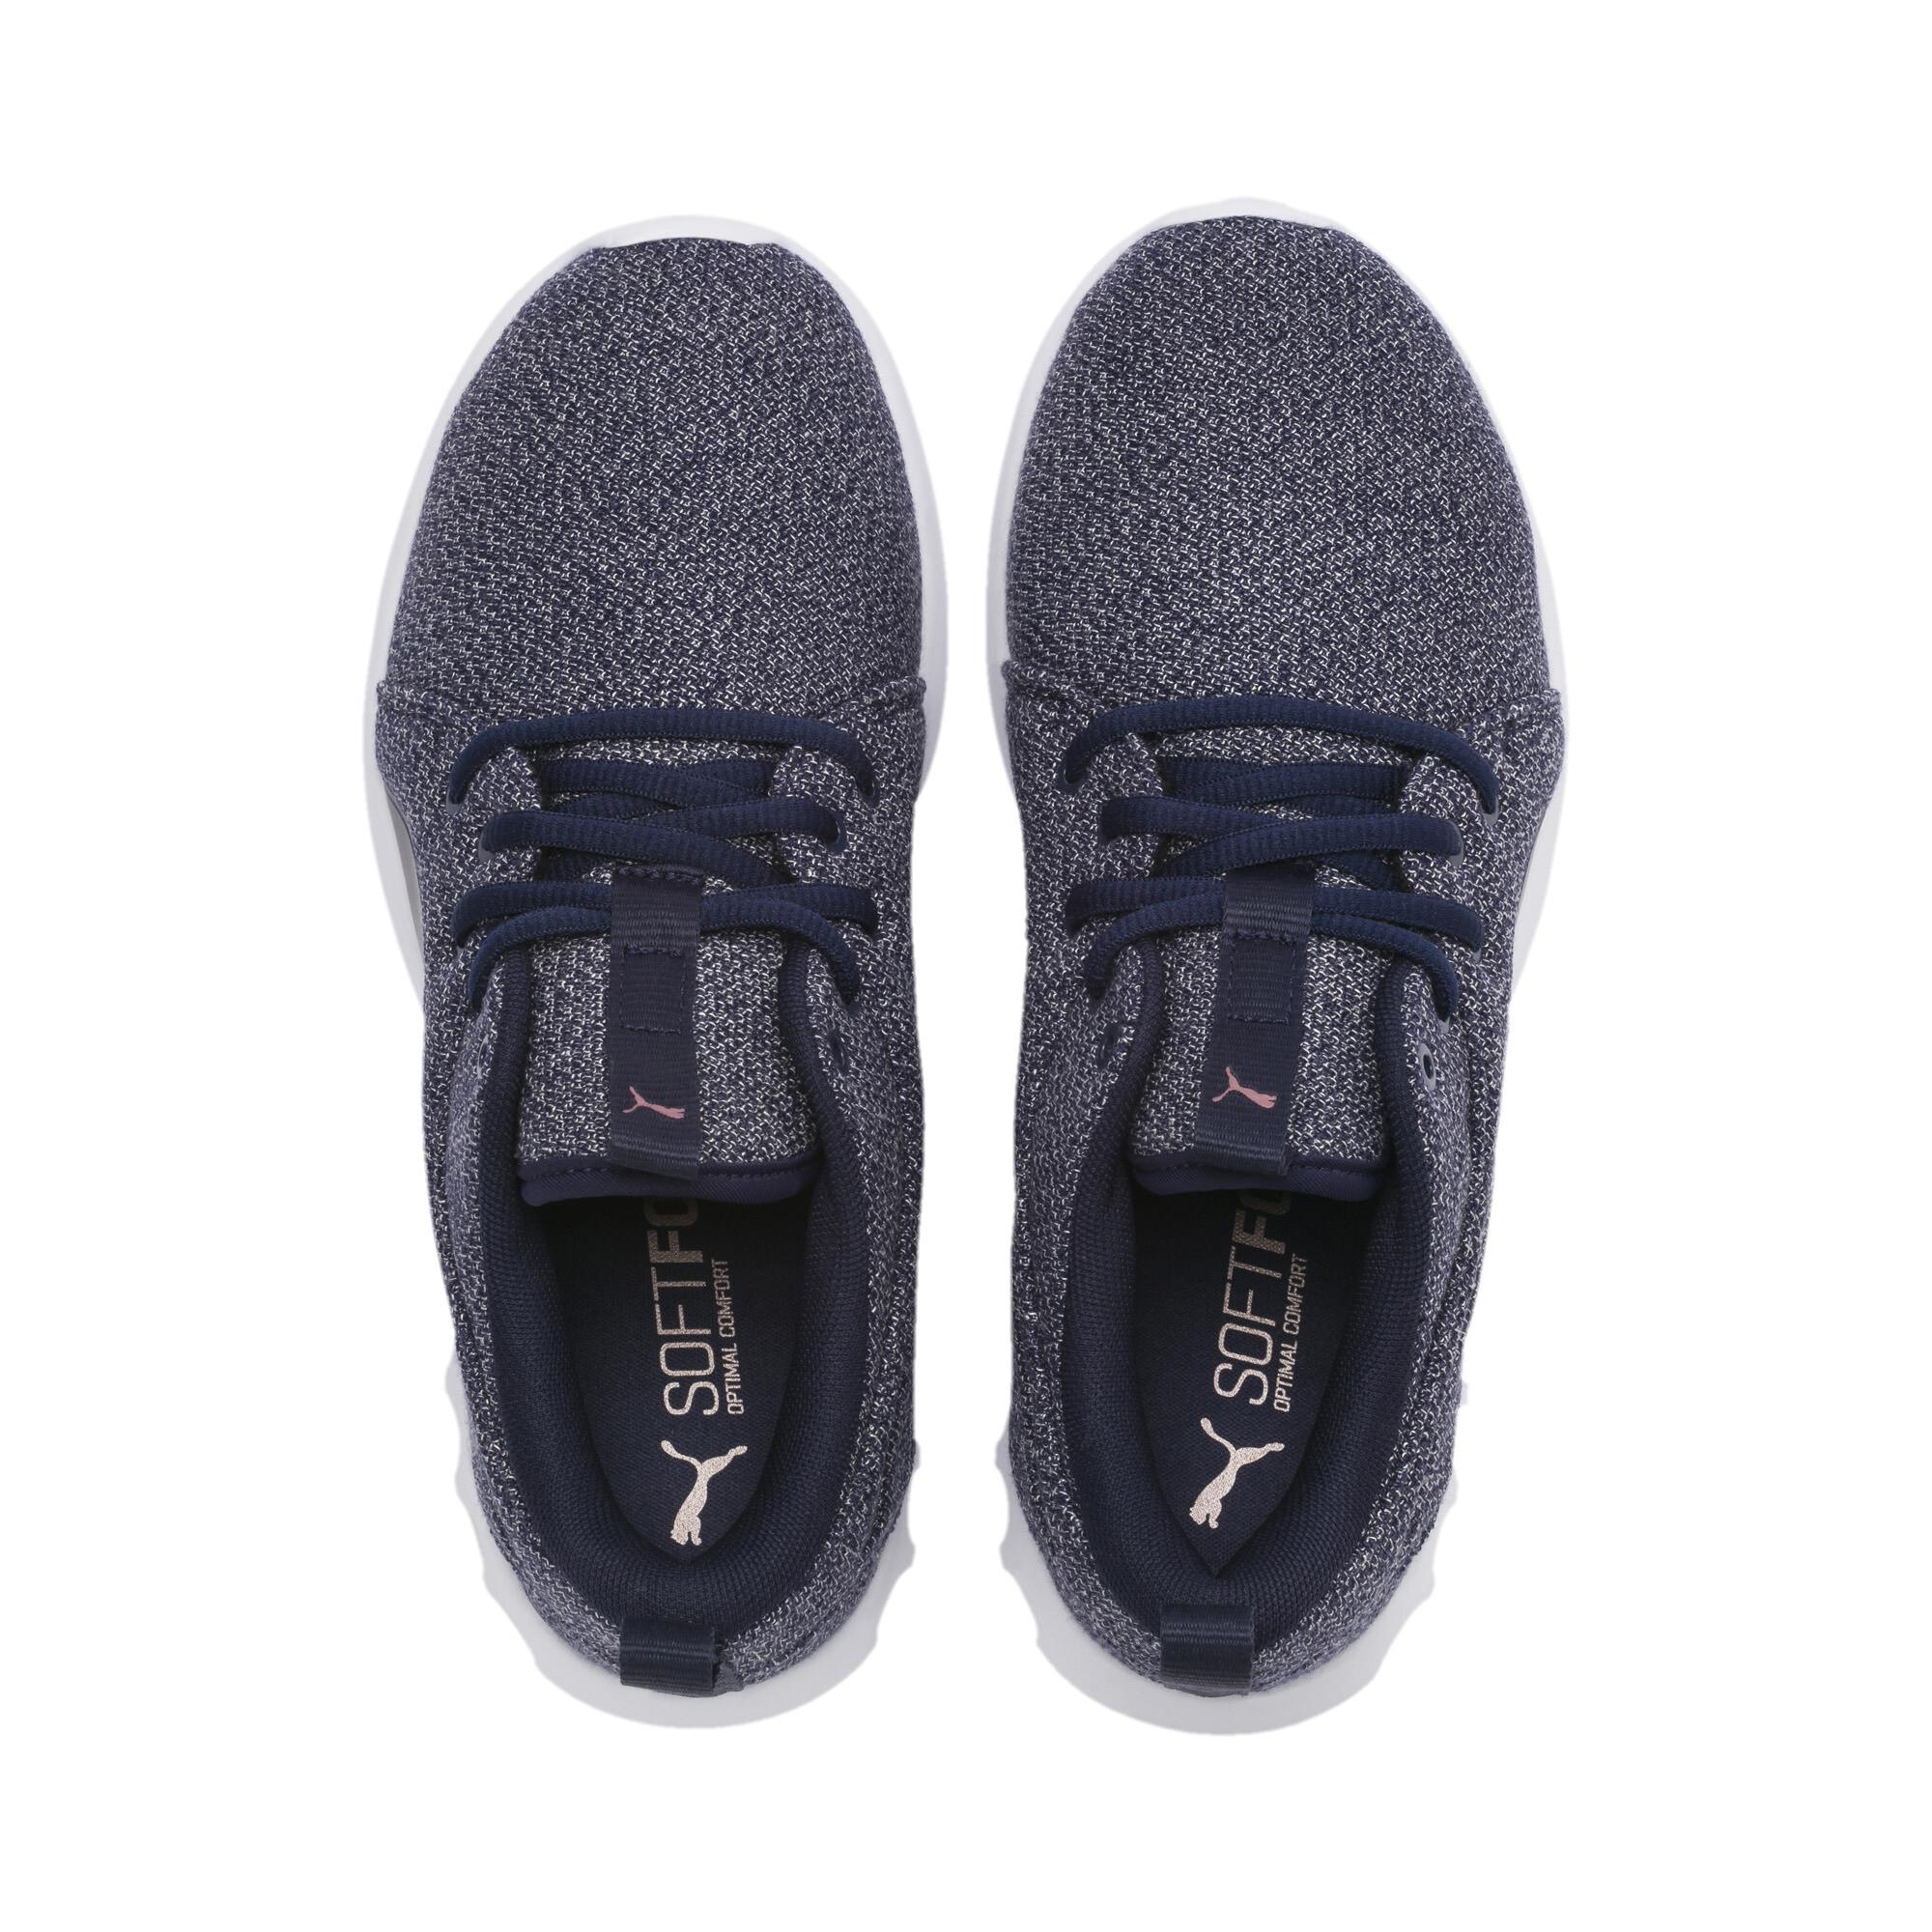 PUMA-Women-039-s-Carson-2-Knit-Running-Shoes thumbnail 32